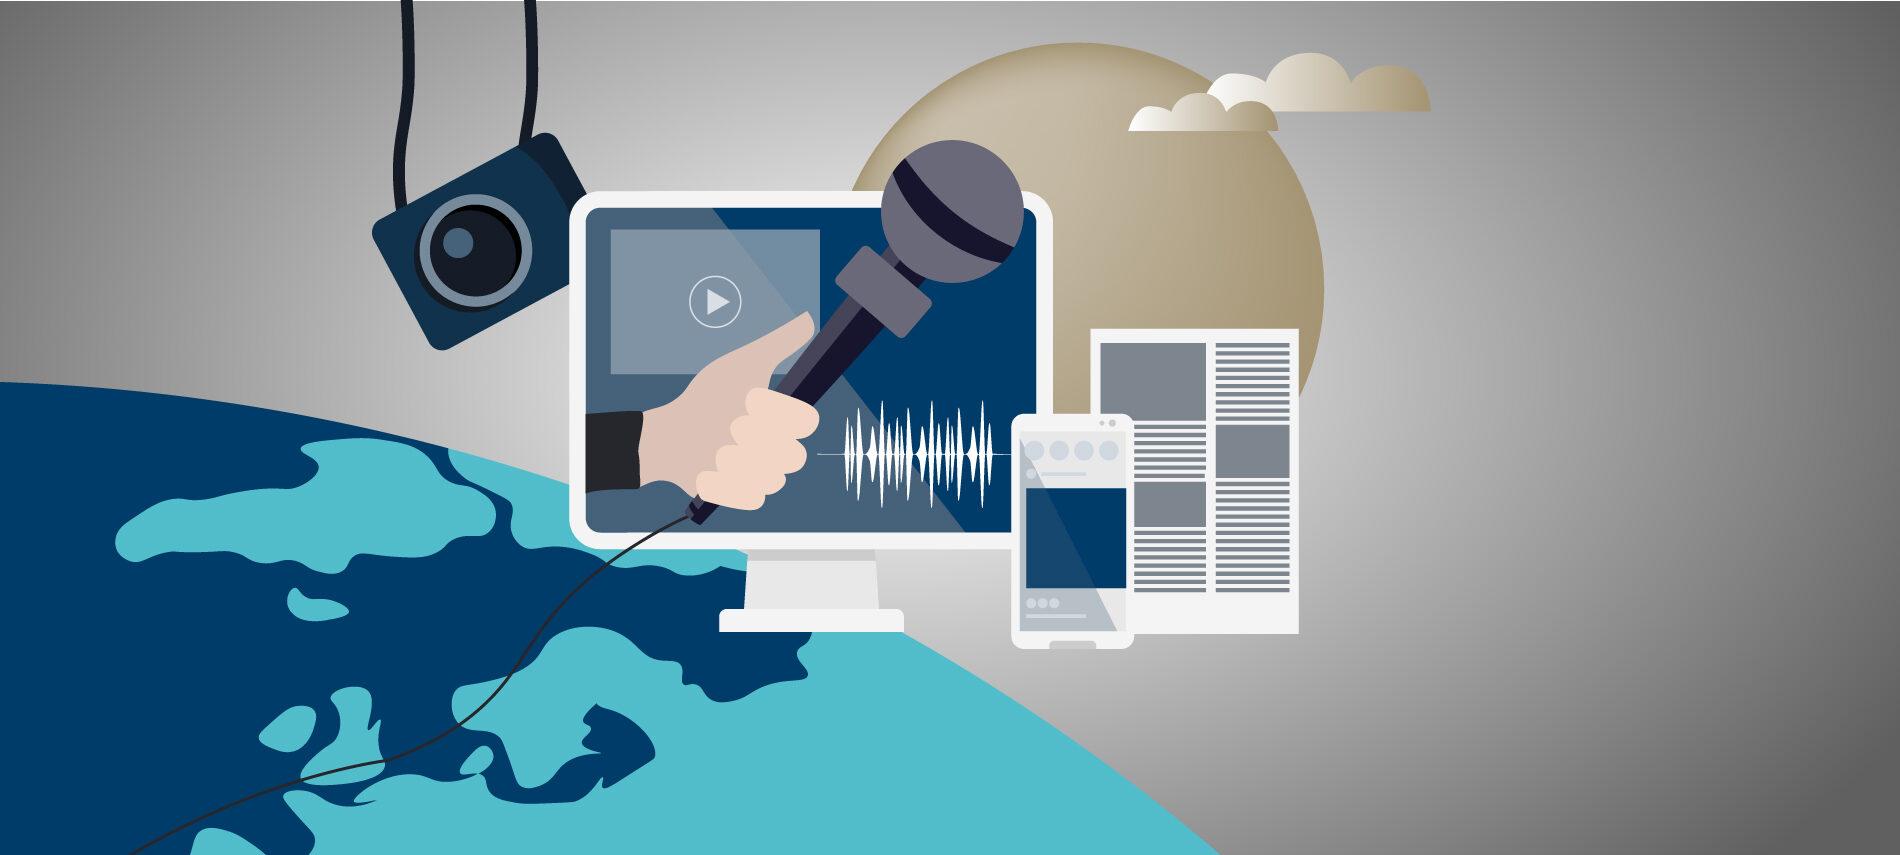 Grafik mit Monitor, Mikrofon, Kamera und Smartphone